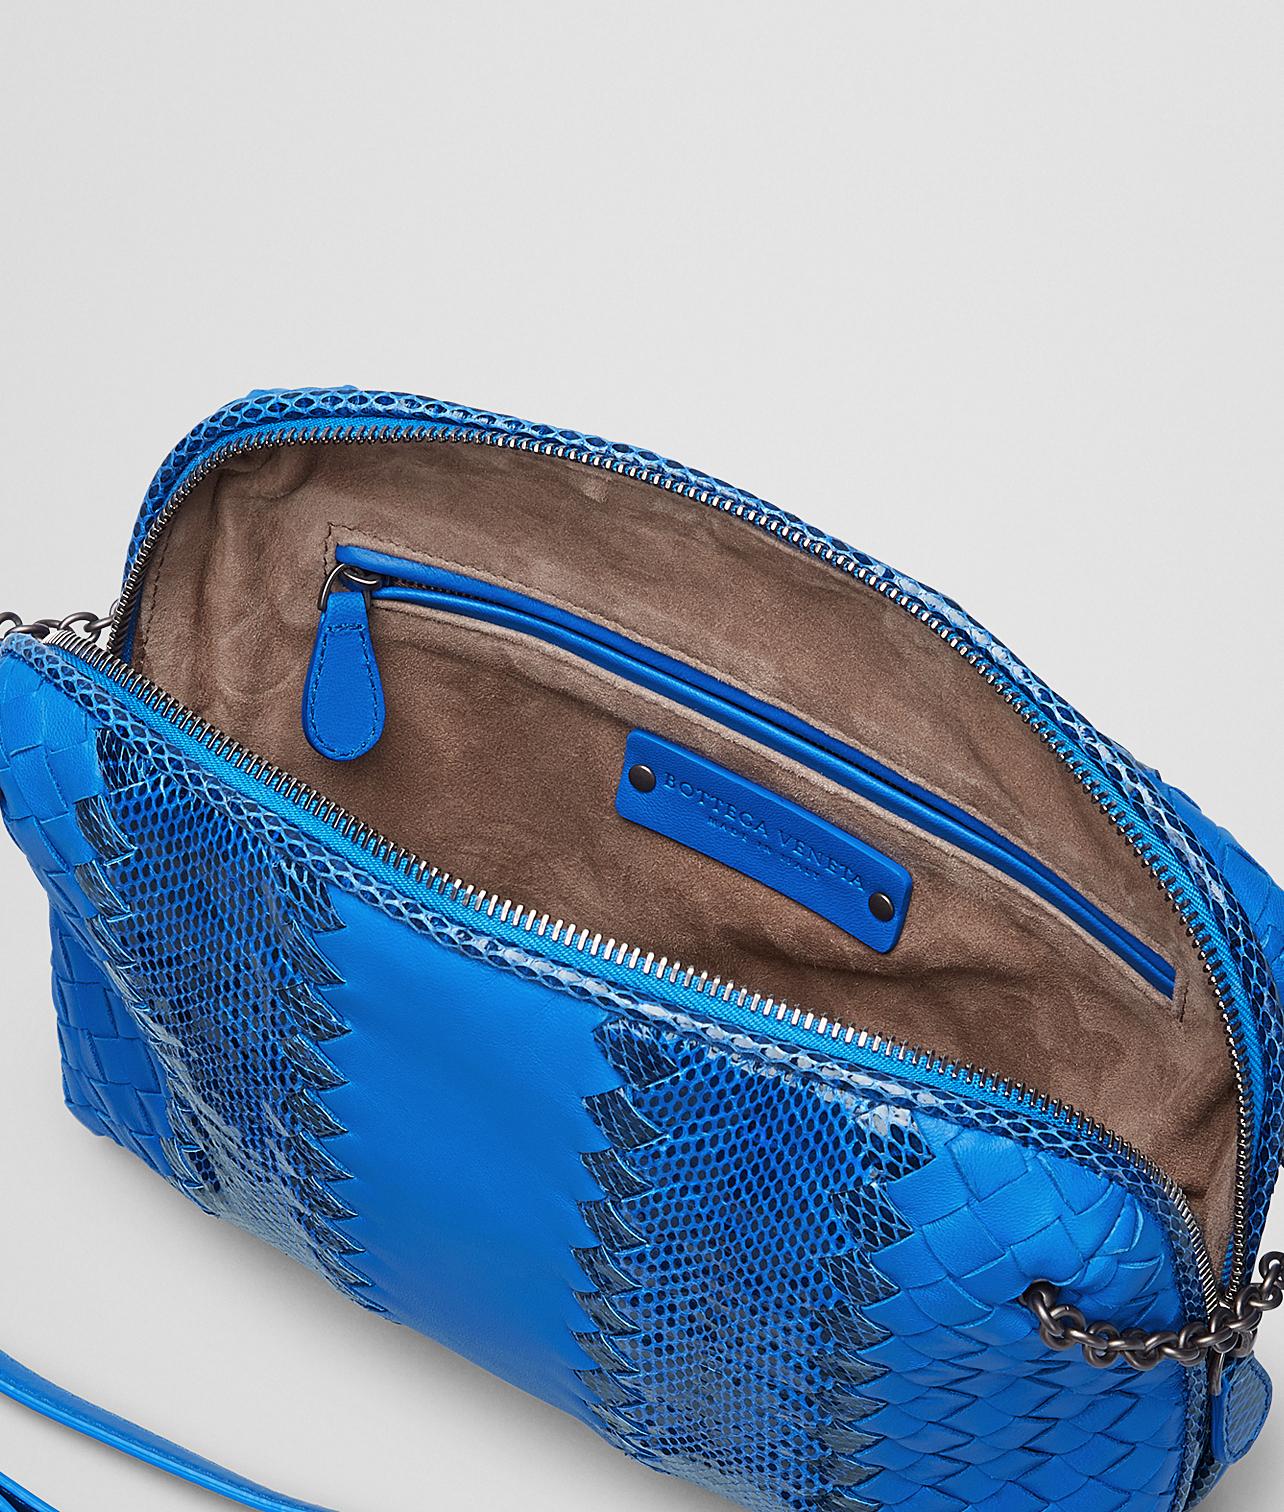 Lyst - Bottega Veneta Signal Blue Intrecciato Nappa Ayers Messenger ... bd302a6480089